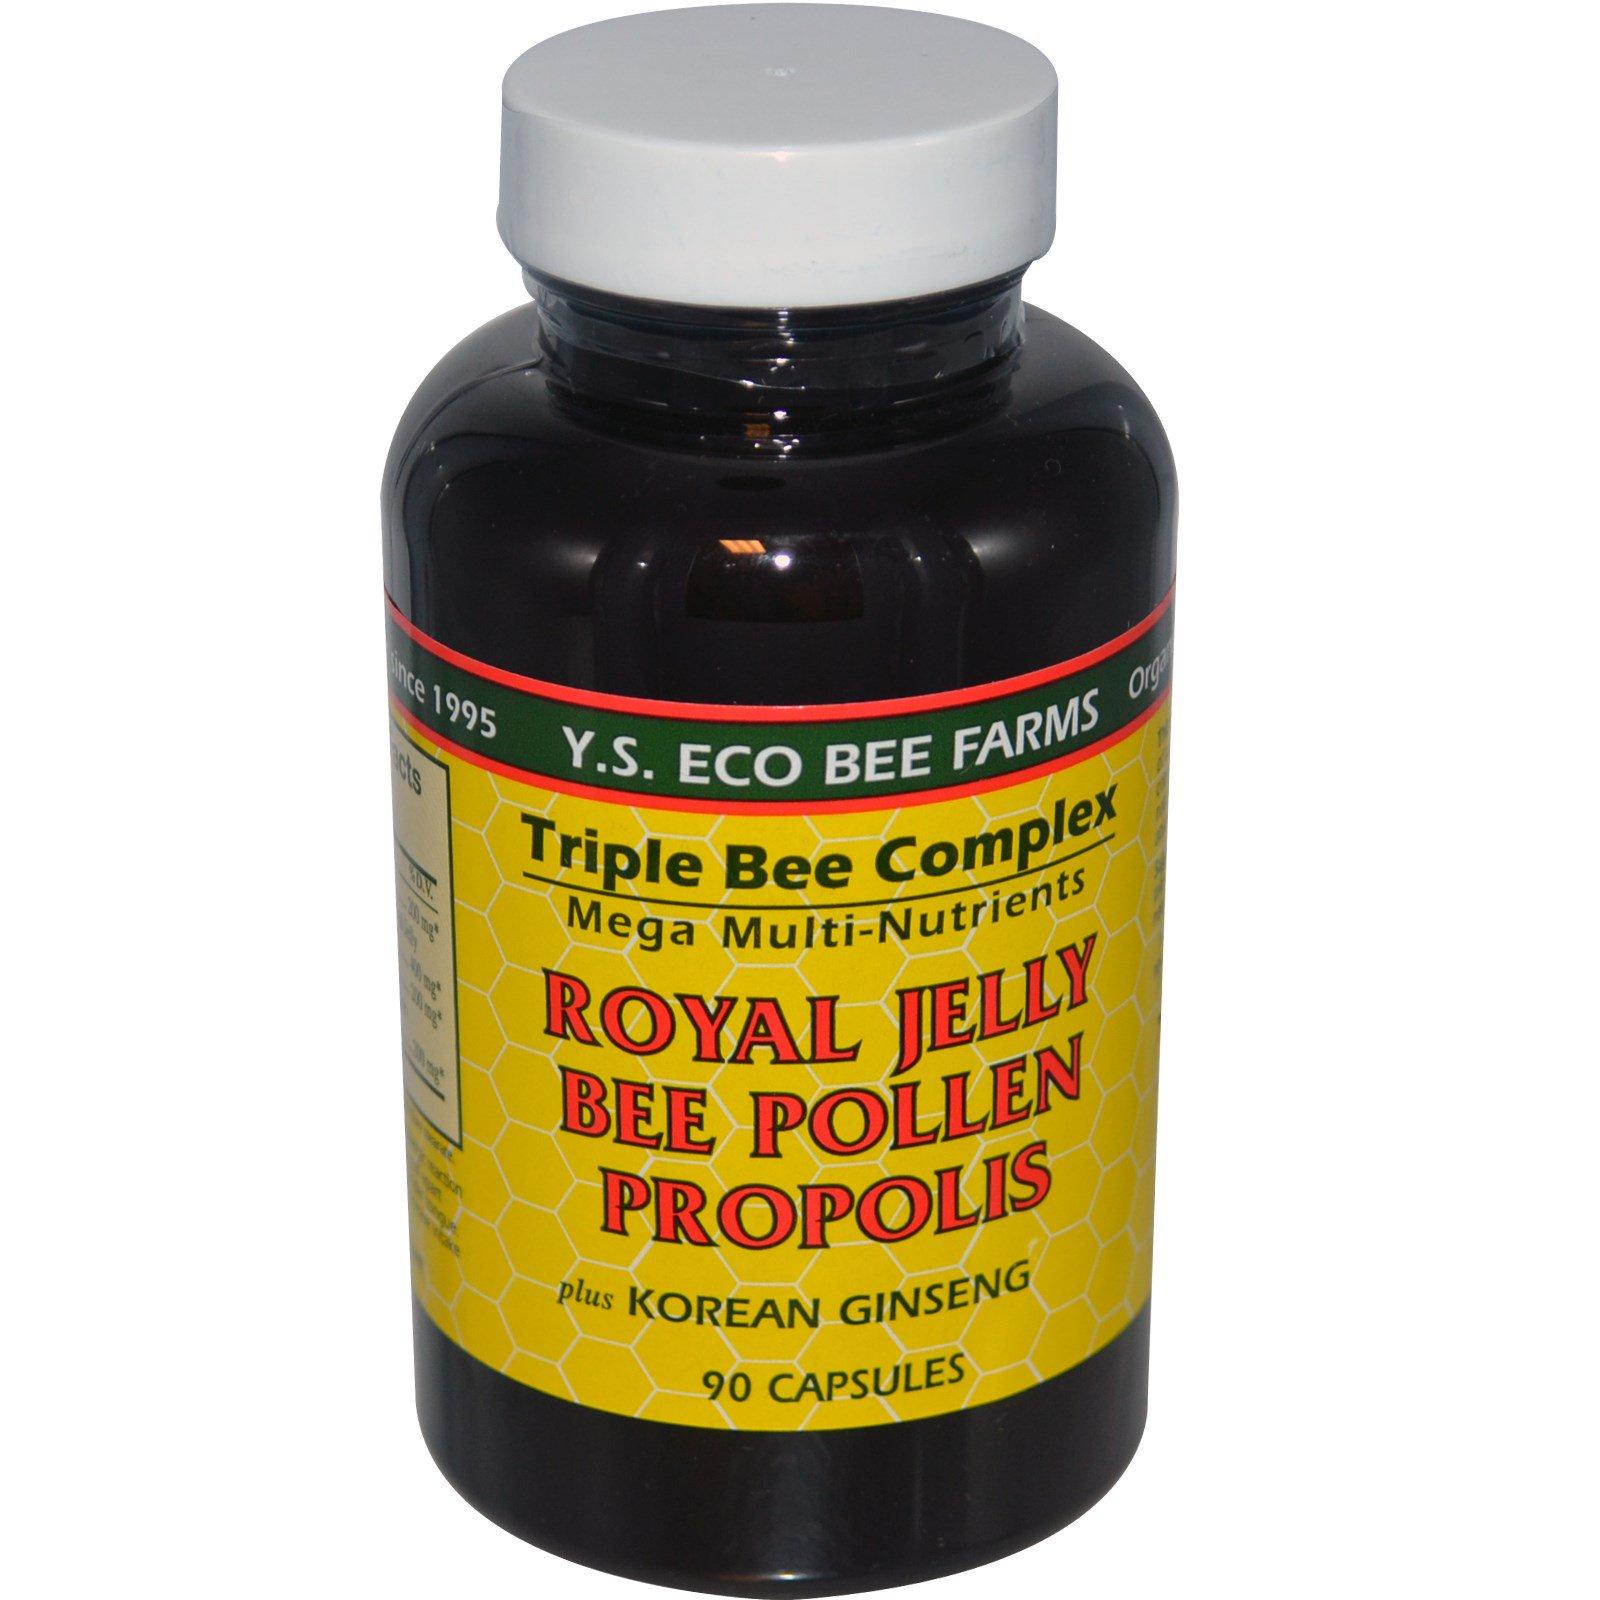 Y S  Eco Bee Farms, Royal Jelly, Bee Pollen, Propolis, Plus Korean Ginseng,  90 Capsules